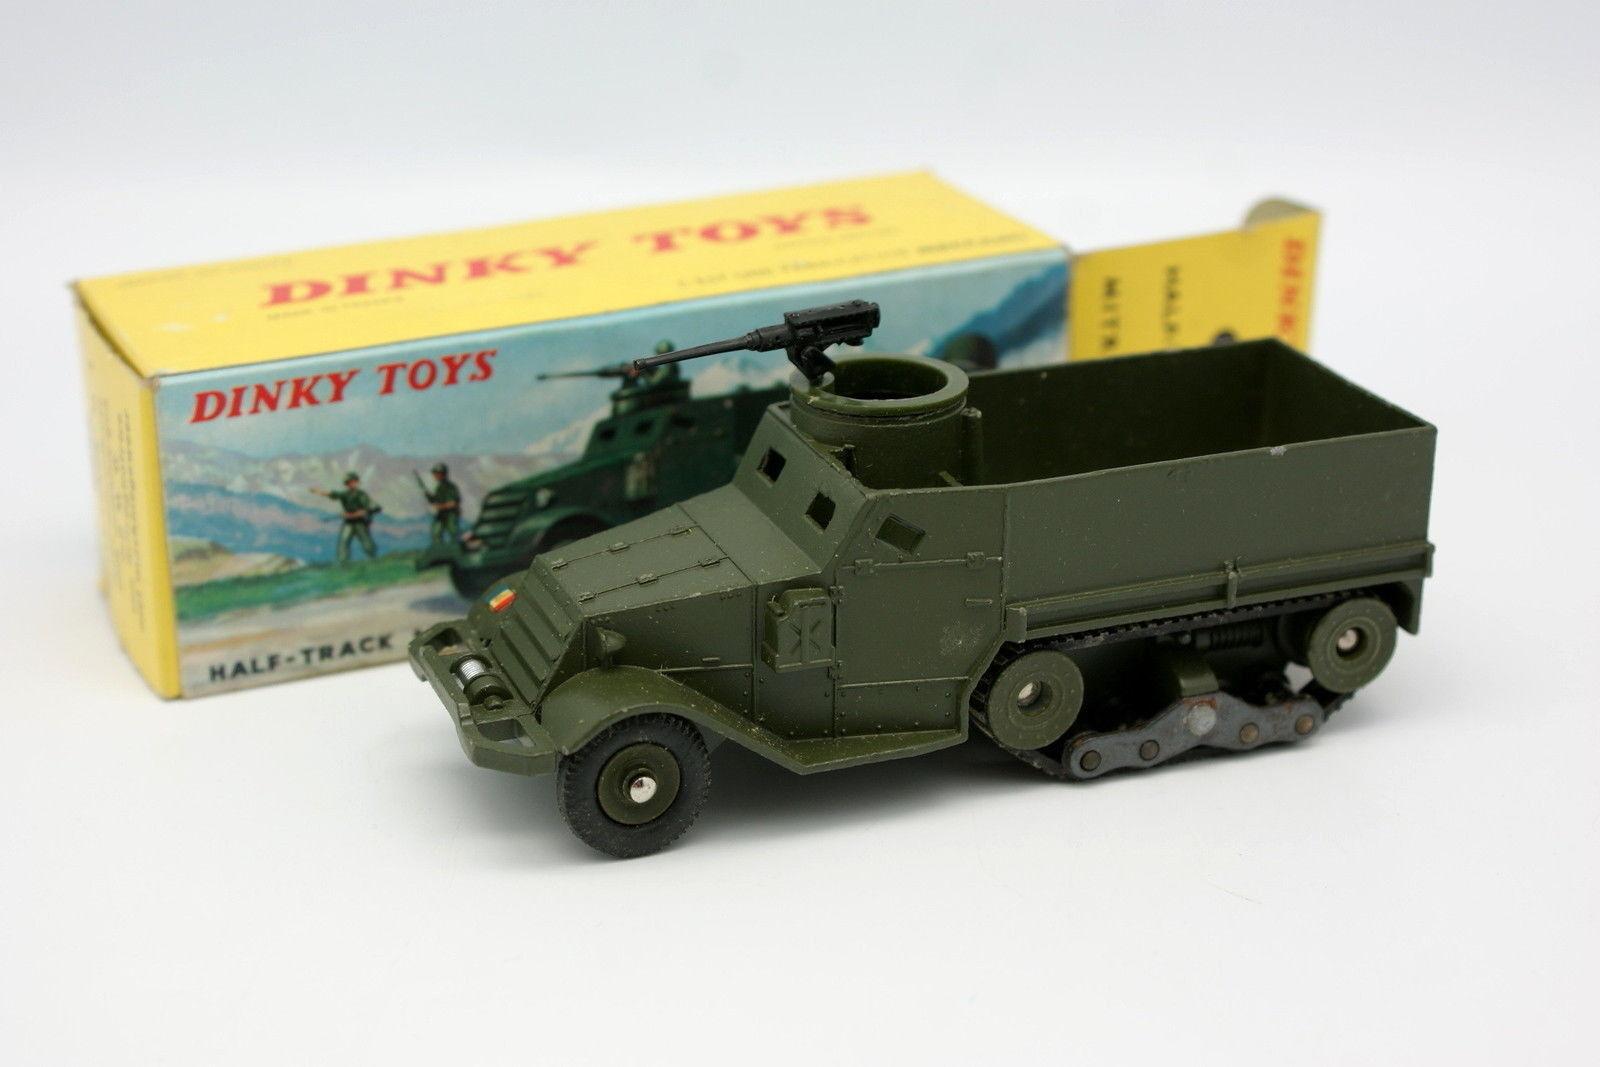 Dinky Toys F Militar 1 43 - Half Track M3 + Caja